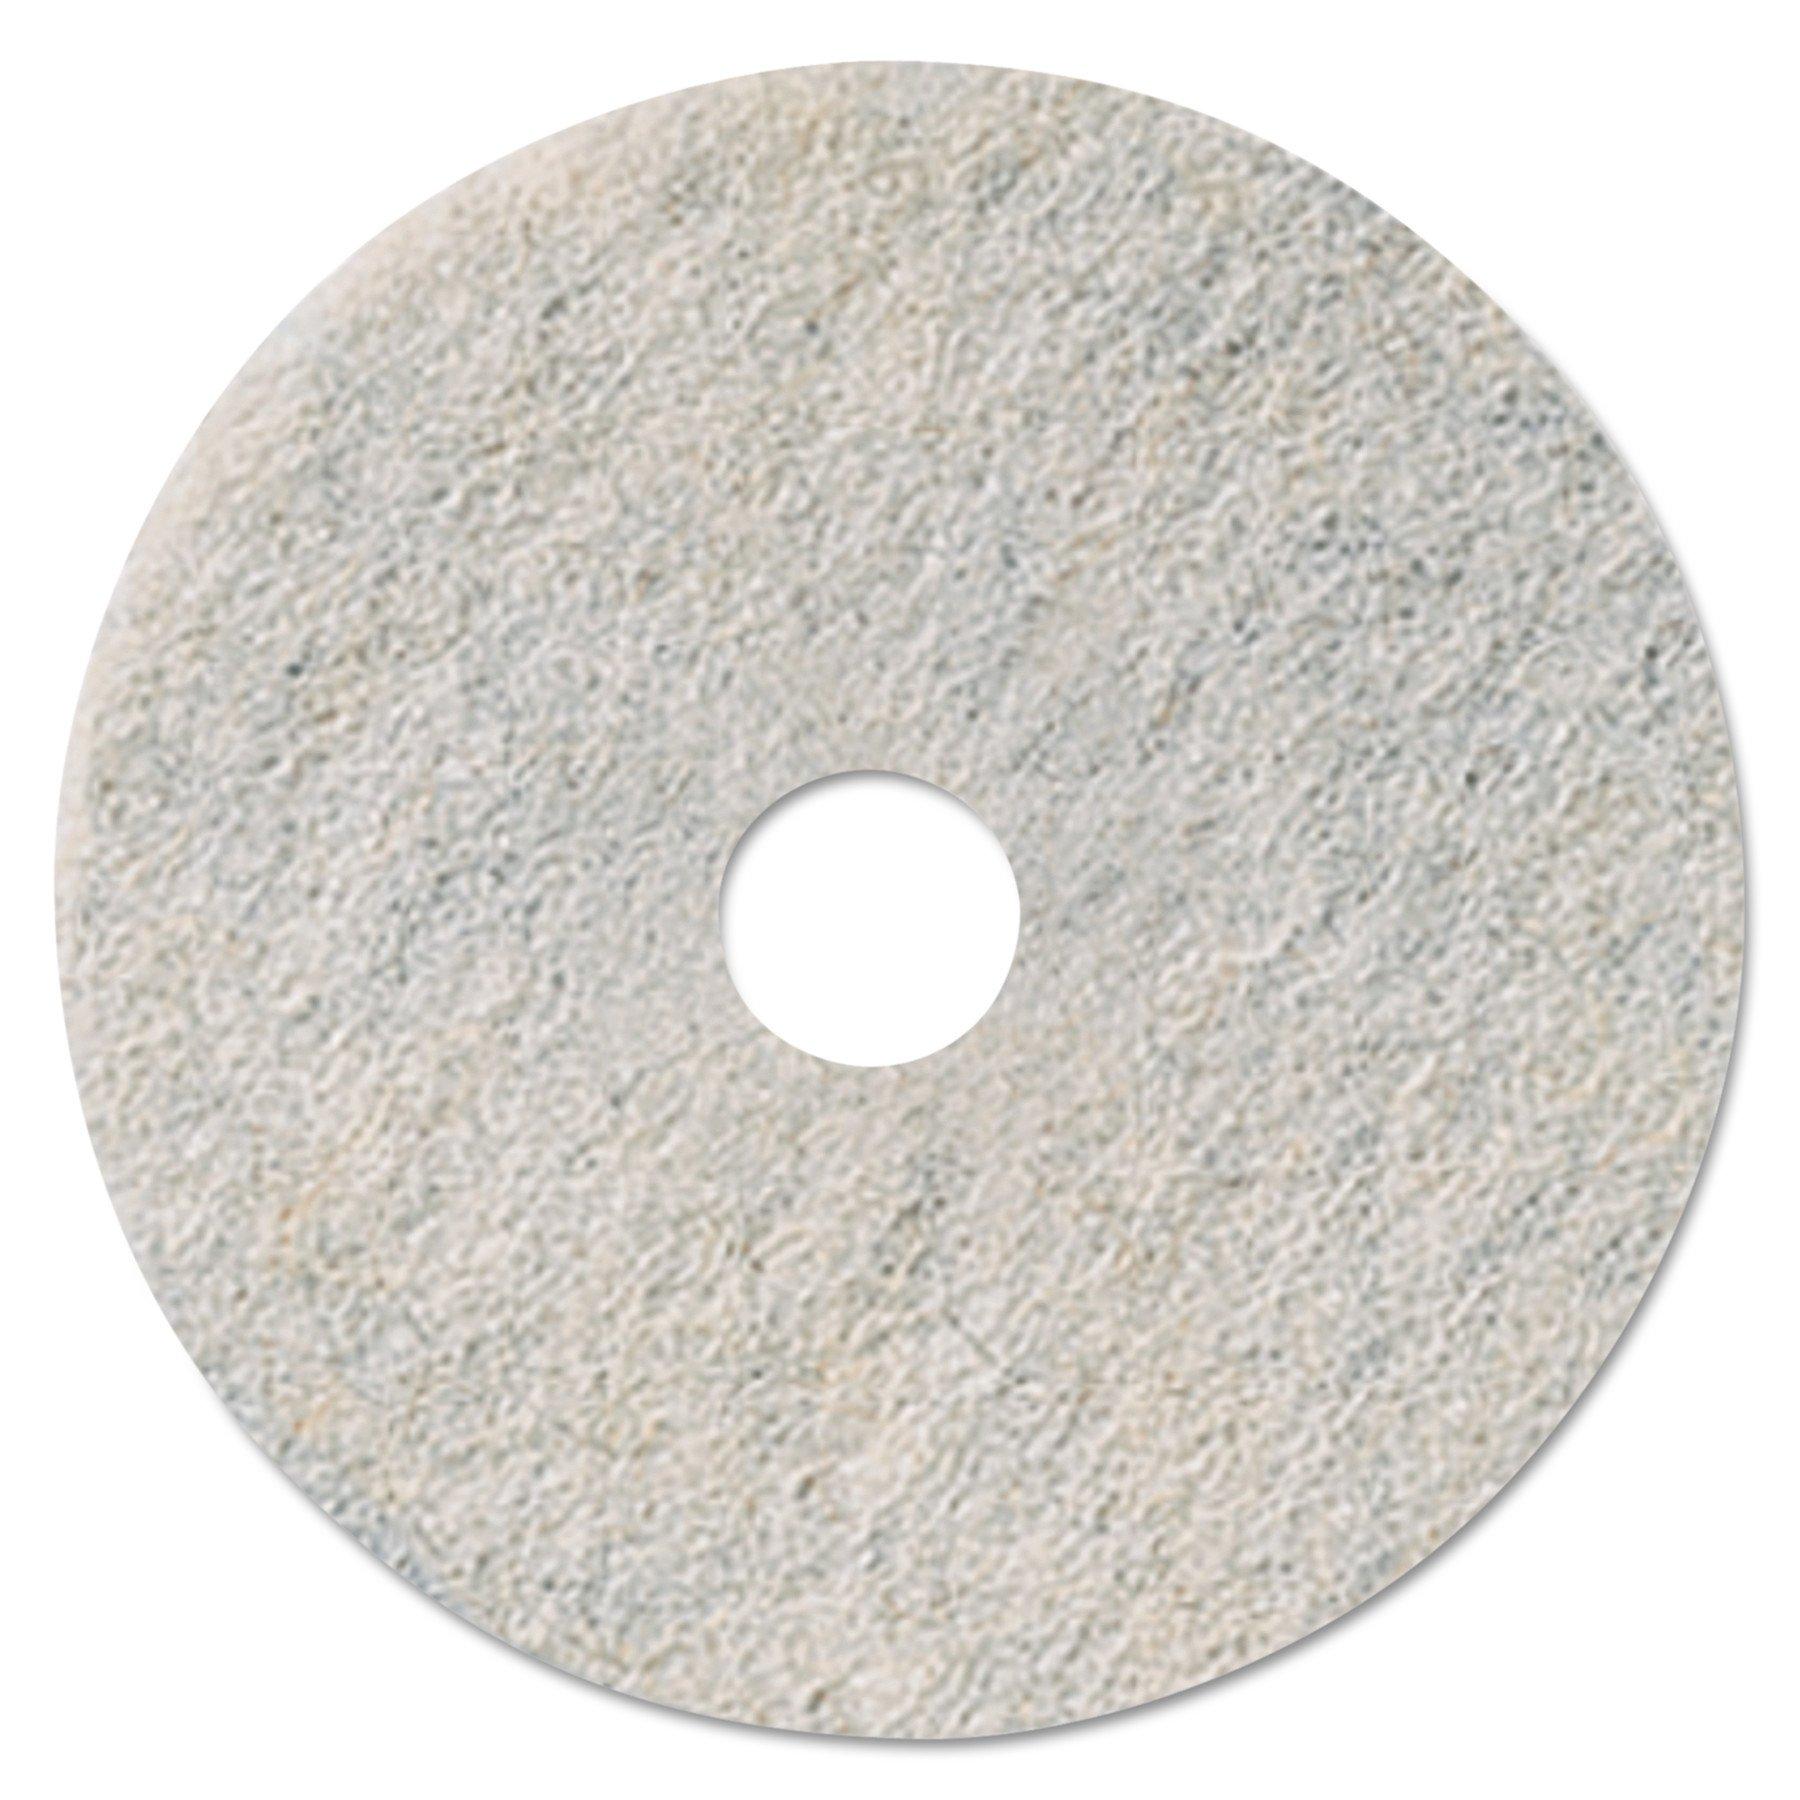 3M 35085 Niagara Natural White Burnishing Pad, 27'' Diameter, White (Case of 5)